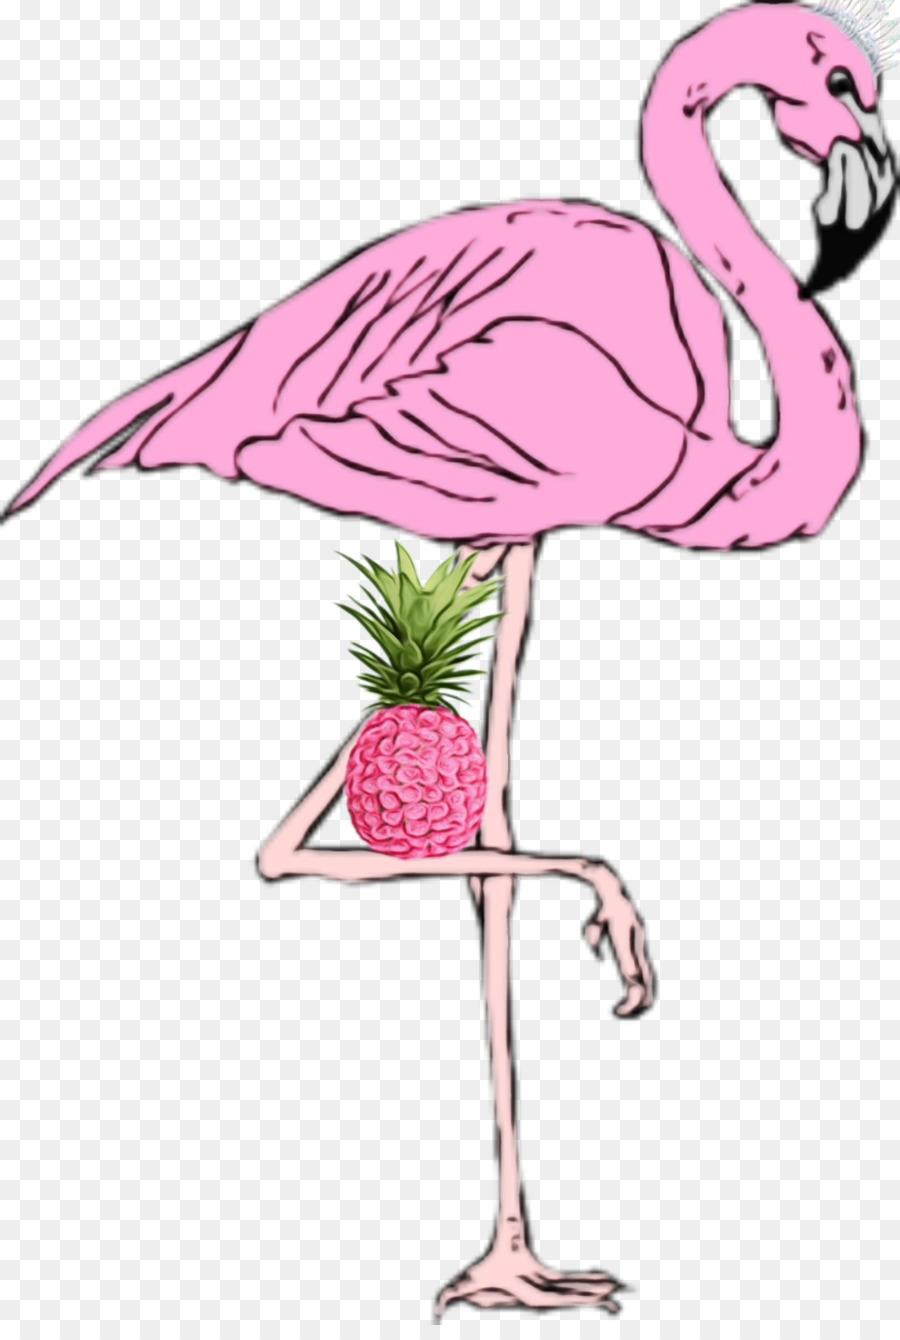 Descarga gratuita de Flamingo, Aves, Rosa Imágen de Png